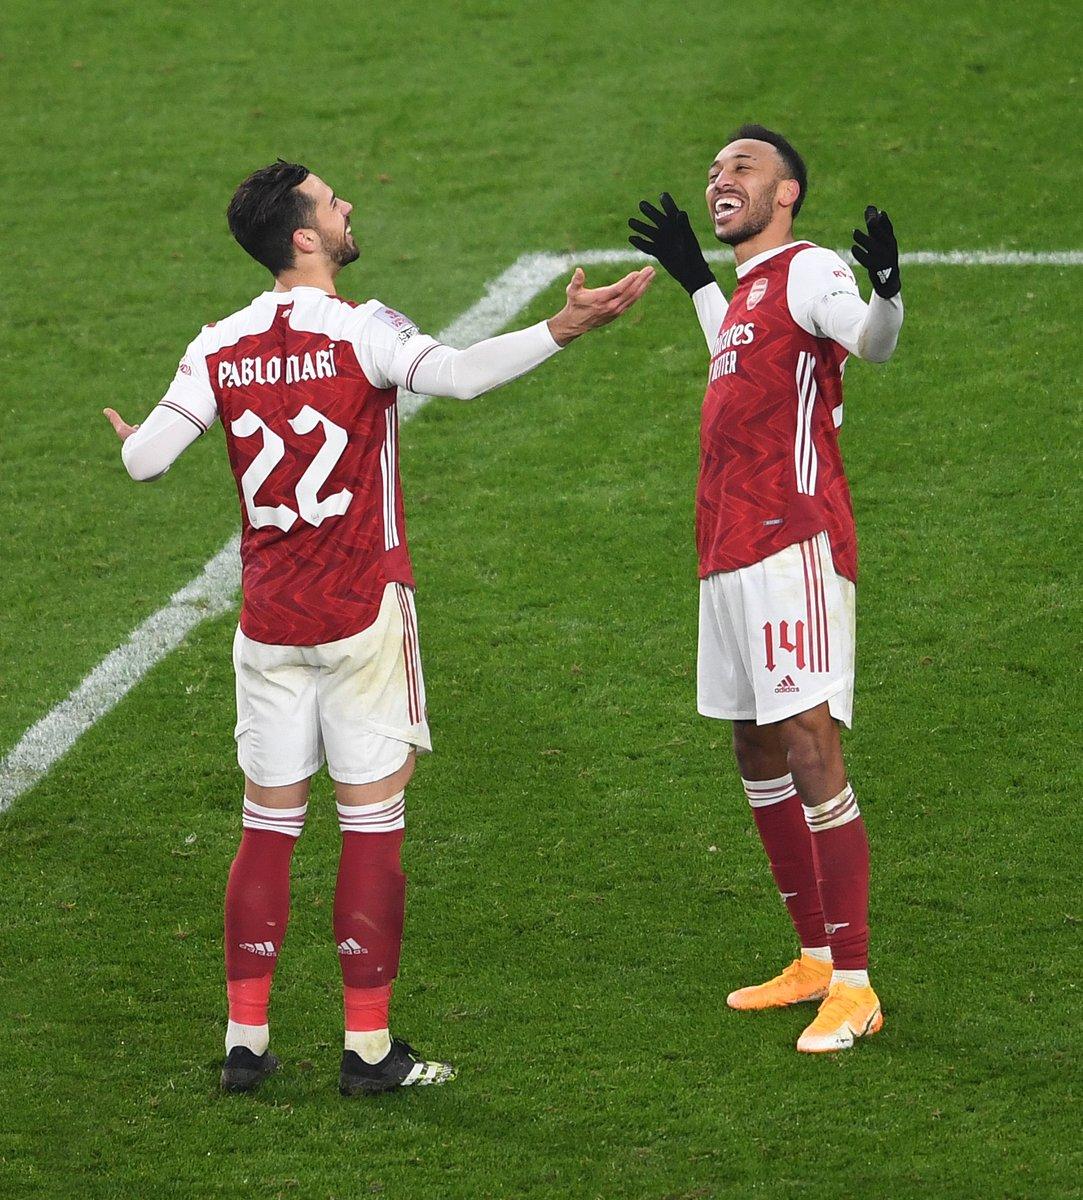 Replying to @Arsenal: 🤷♂️😅🤝  @PabloMV5 x @Aubameyang7